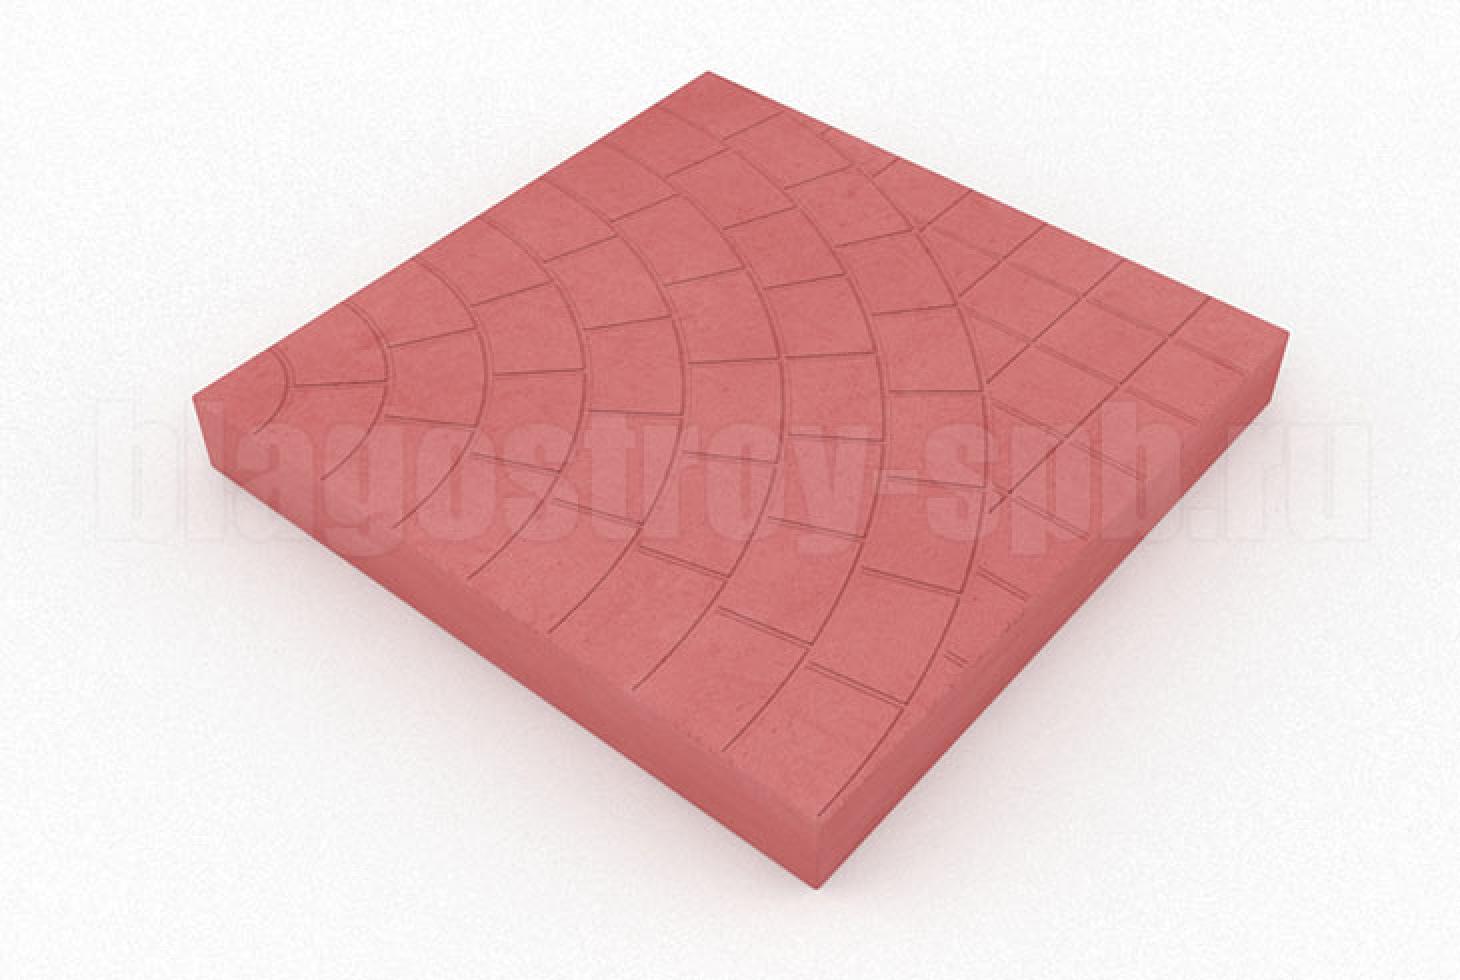 плитка паутина-40 красная